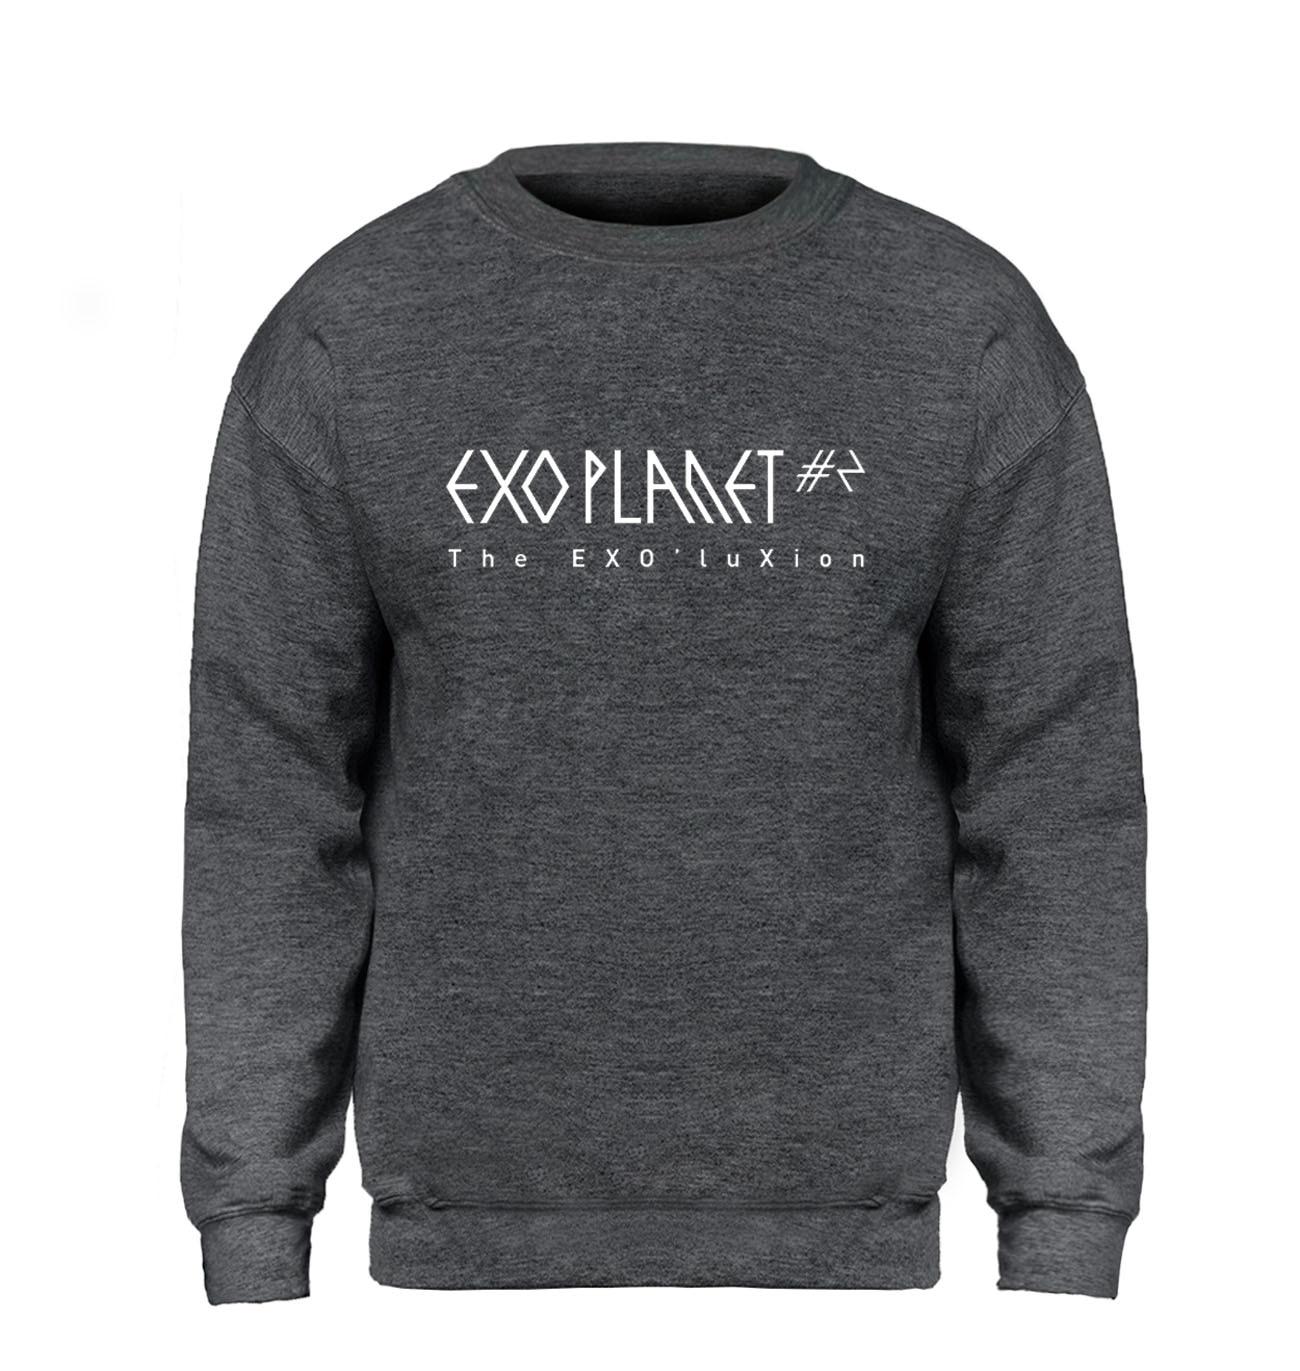 Punk Rock Music Sweatshirt Men Hip Hop Hoodie Sweatshirts Winter Autumn Fleece Warm Korean Hipster Black Gray Brand Streetwear